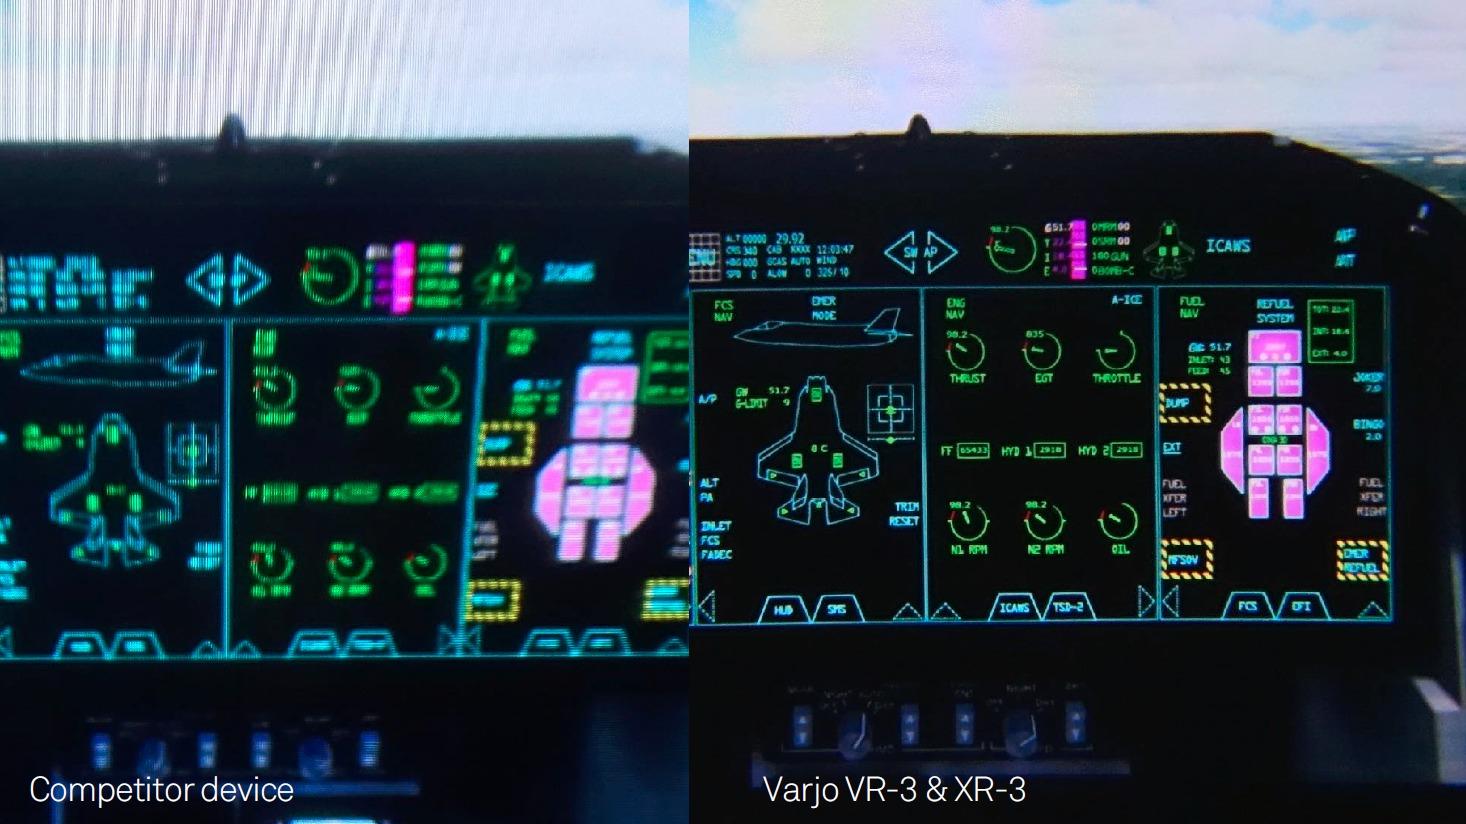 Varjo VR-3 virtual reality headset image comparison